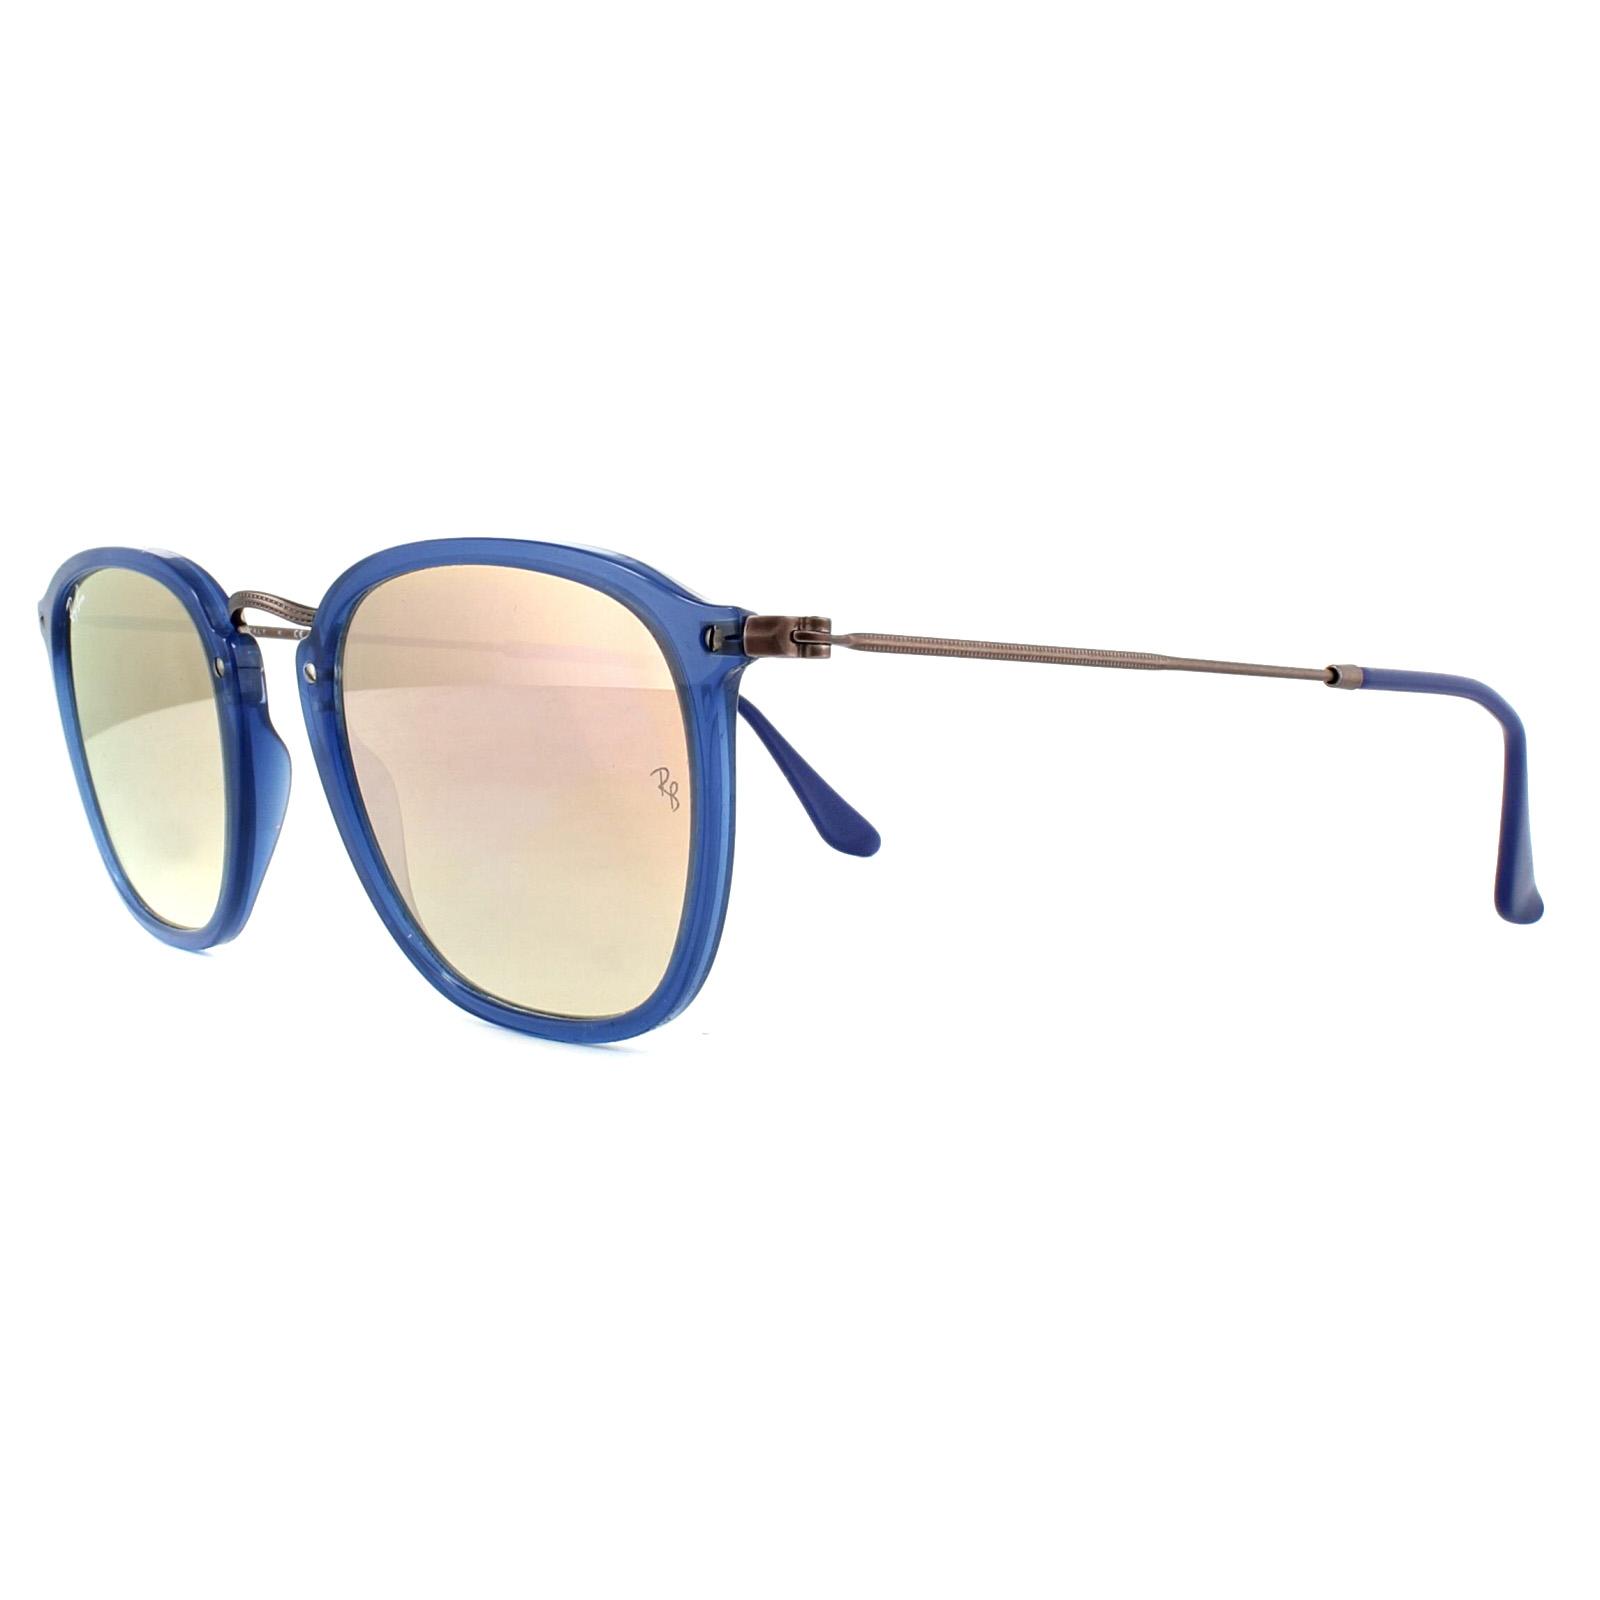 3f512f7388 Sentinel Ray-Ban Sunglasses 2448N 62547O Blue Brown Copper Gradient Mirror